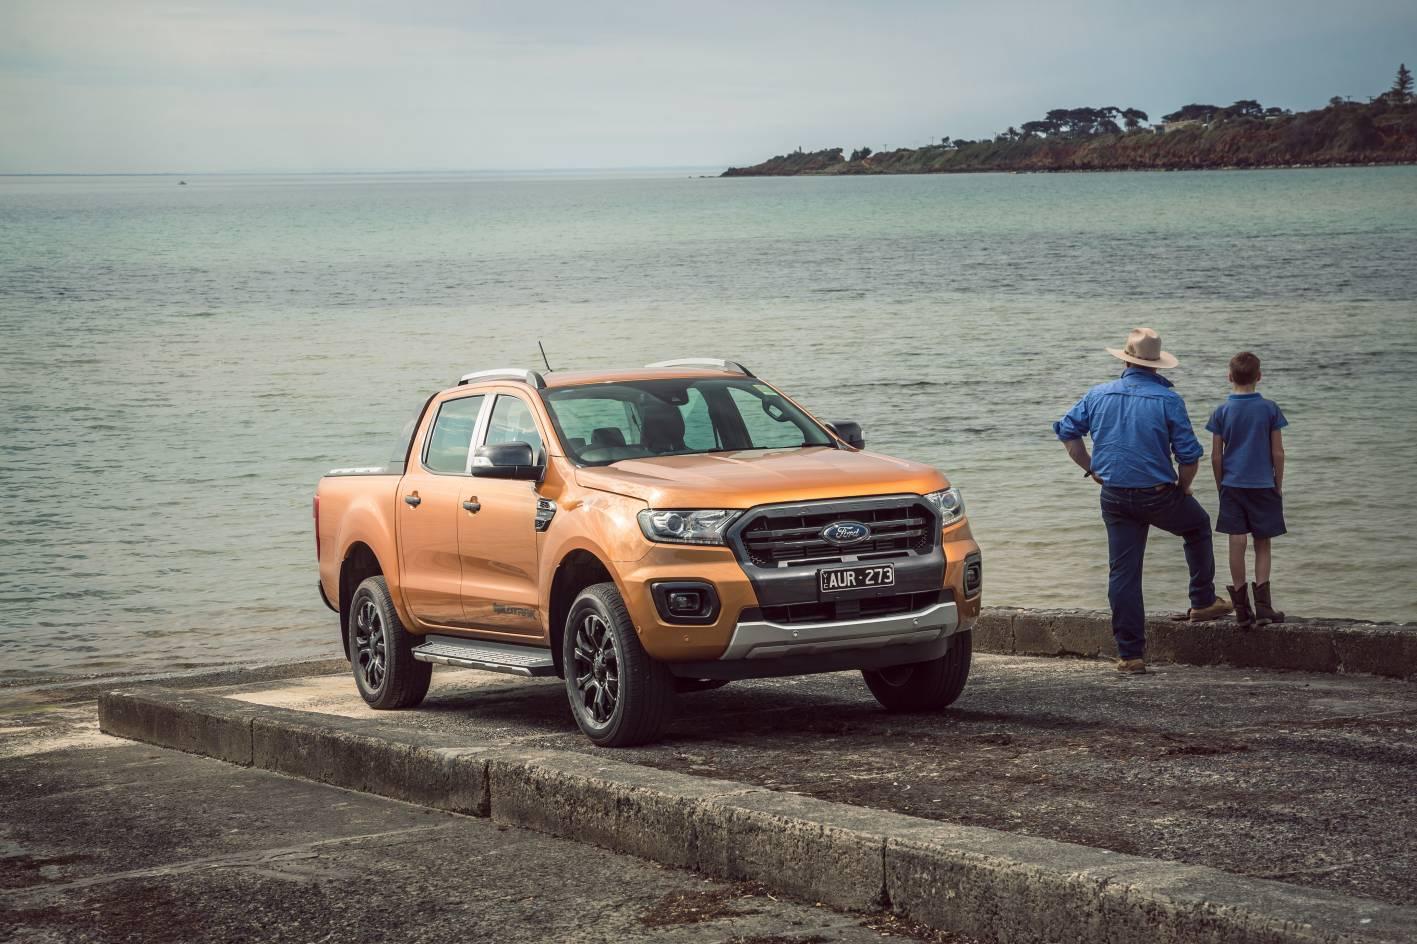 Should I Buy a Ford Ranger Ute Despite the Oil Change Issue